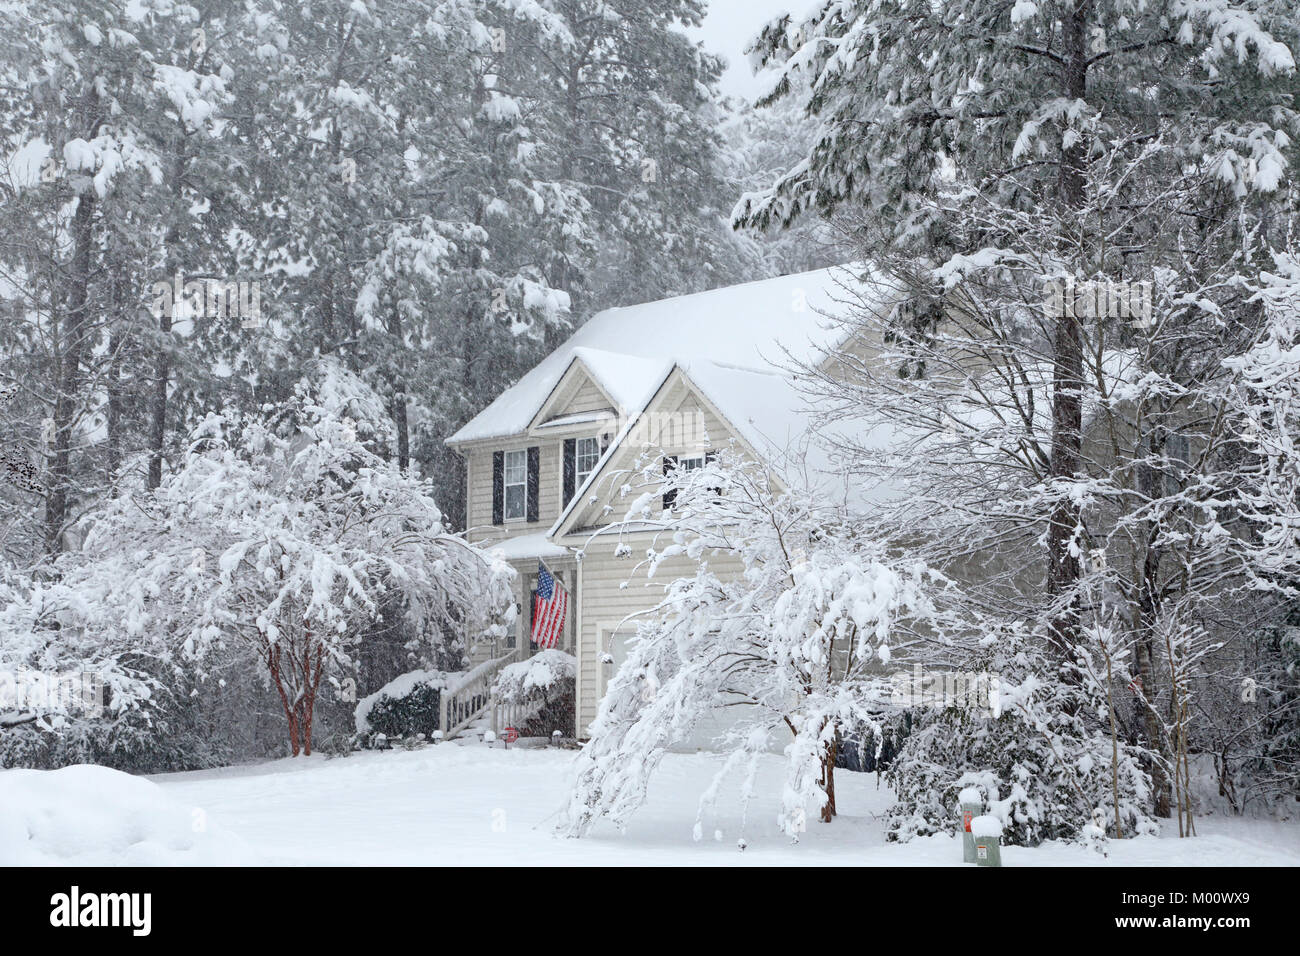 Durham, North Carolina, 17th Jan, 2018. Heavy snowfall in Durham, North Carolina. Credit: Rose-Marie Murray/Alamy Stock Photo